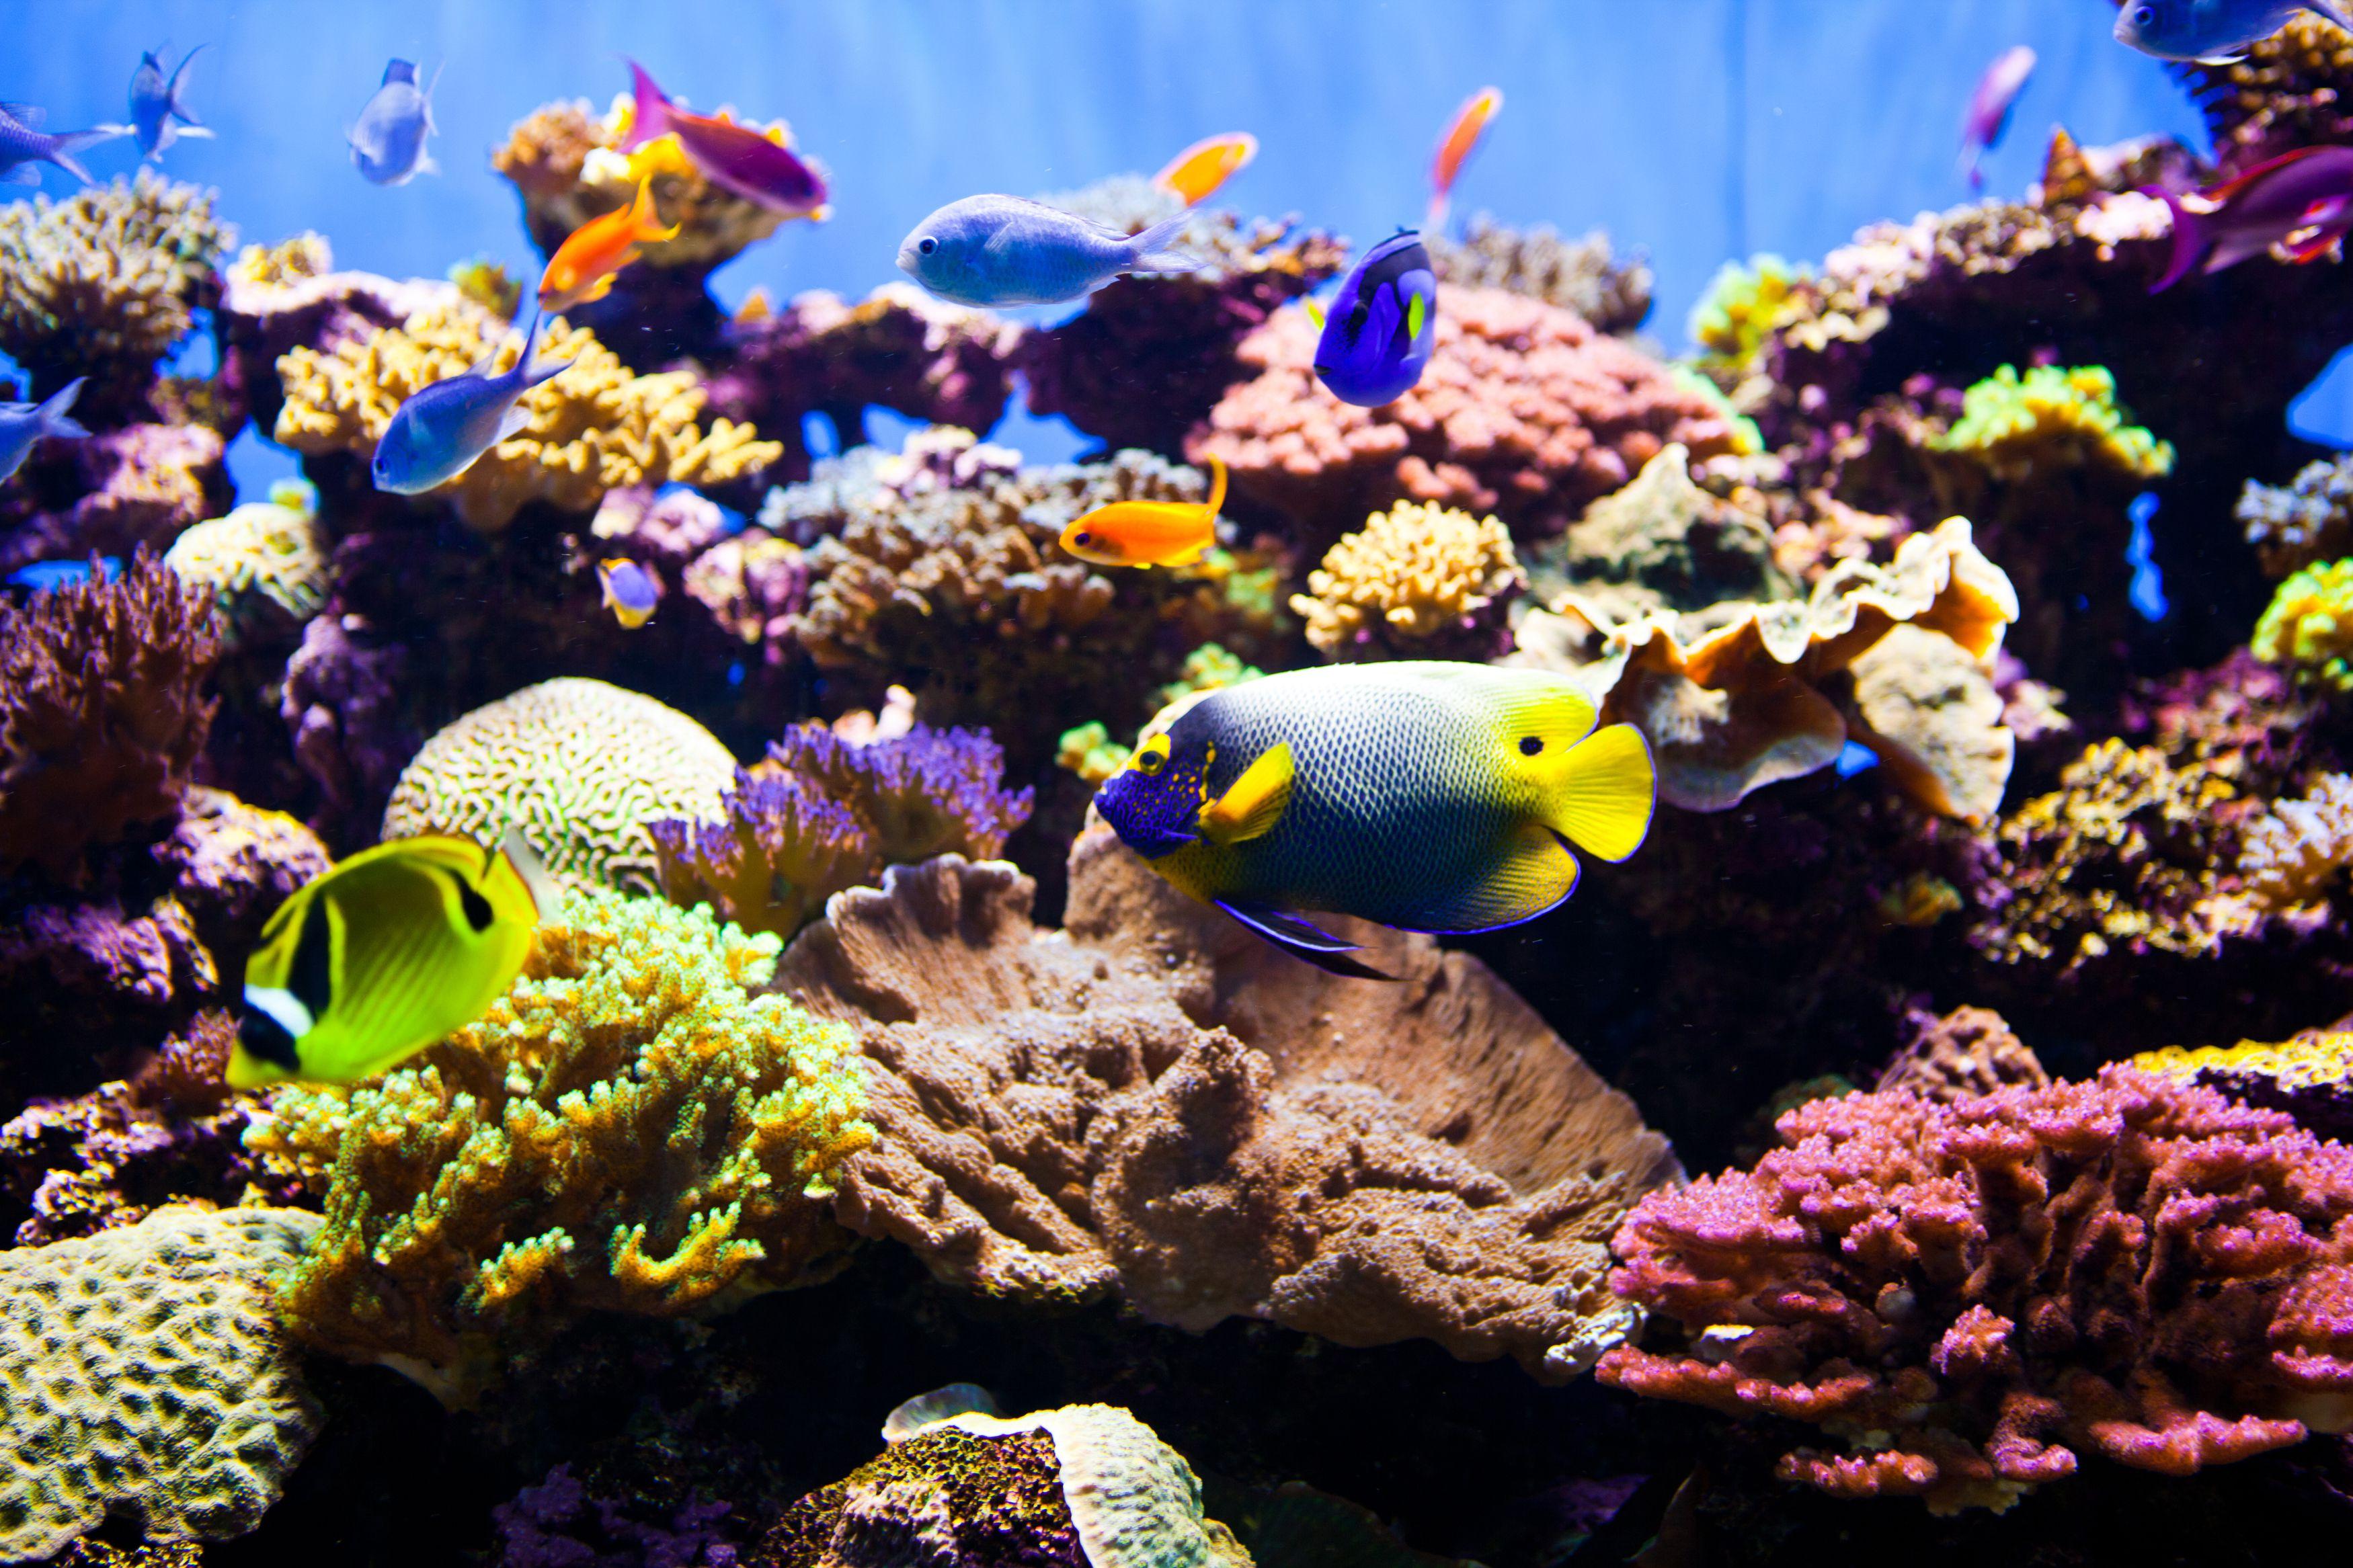 Removing Brown Diatom Algae From Saltwater Aquariums